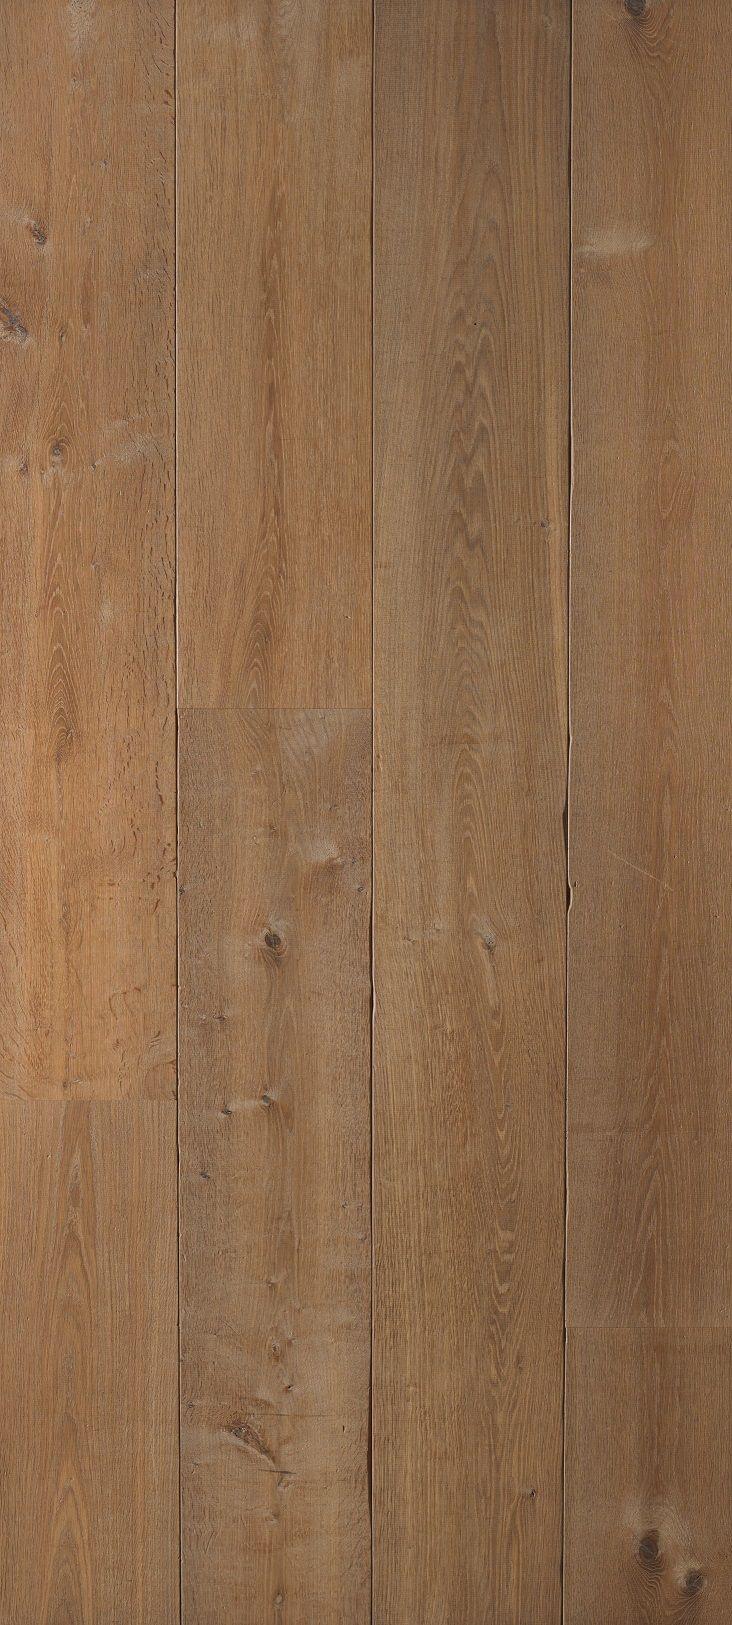 Old Floor collectie eiken duoplank ROCKINGHAM  Afwerking: getrommeld, hand gekapte velling, gerookt en wit geolied. 26 cm breed